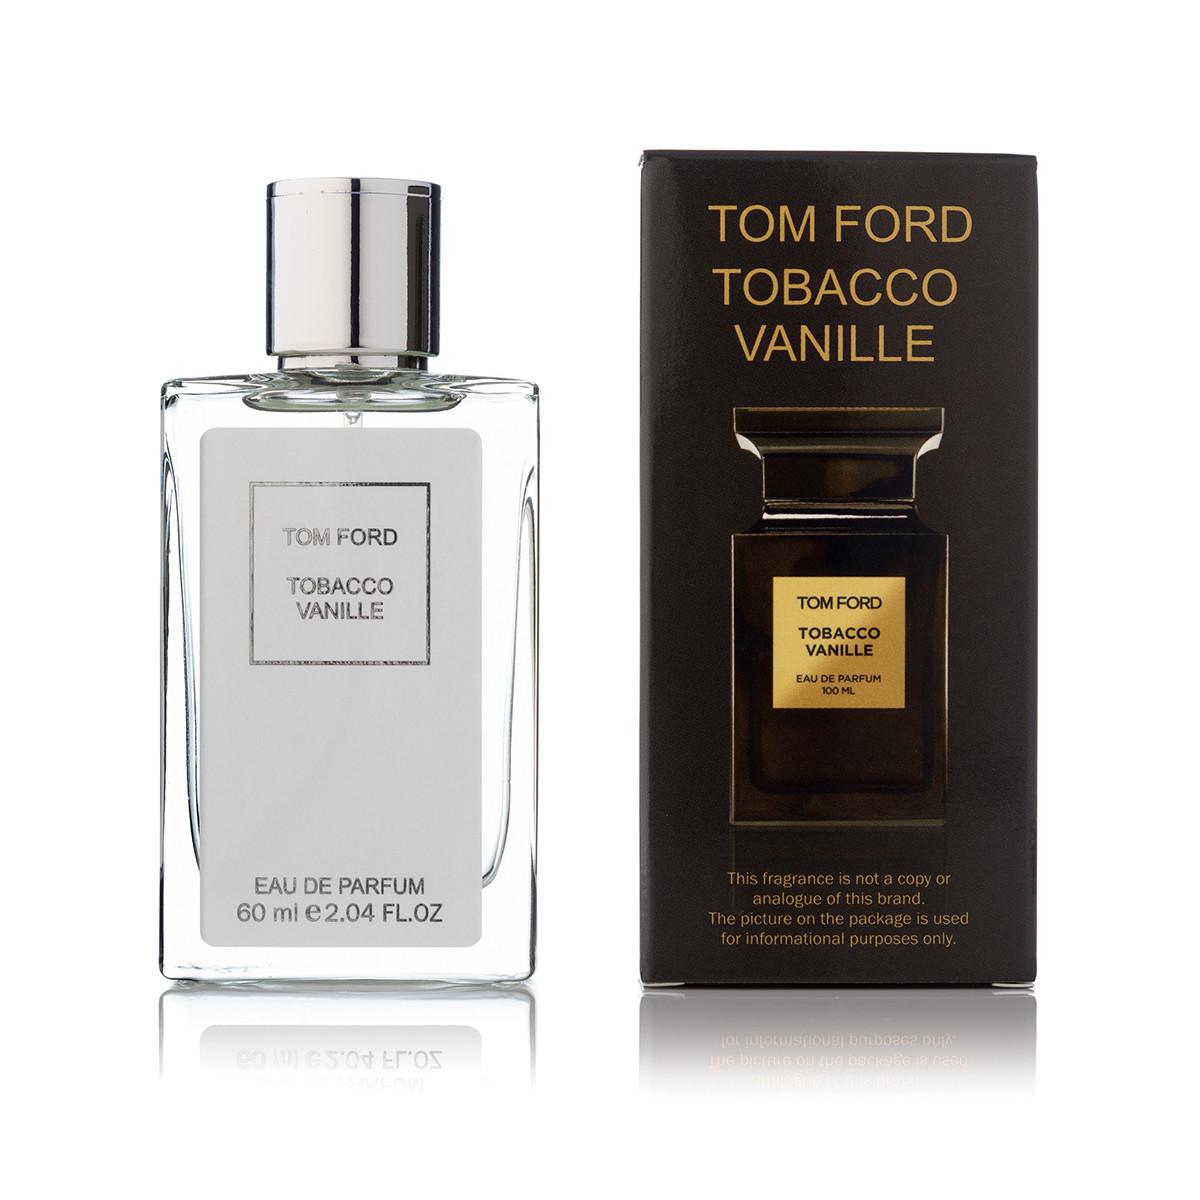 Tom Ford Tobacco Vanille (том форд тобако ваниль) парфюм унисекс тестер 60 ml  в цветной упаковке (реплика)